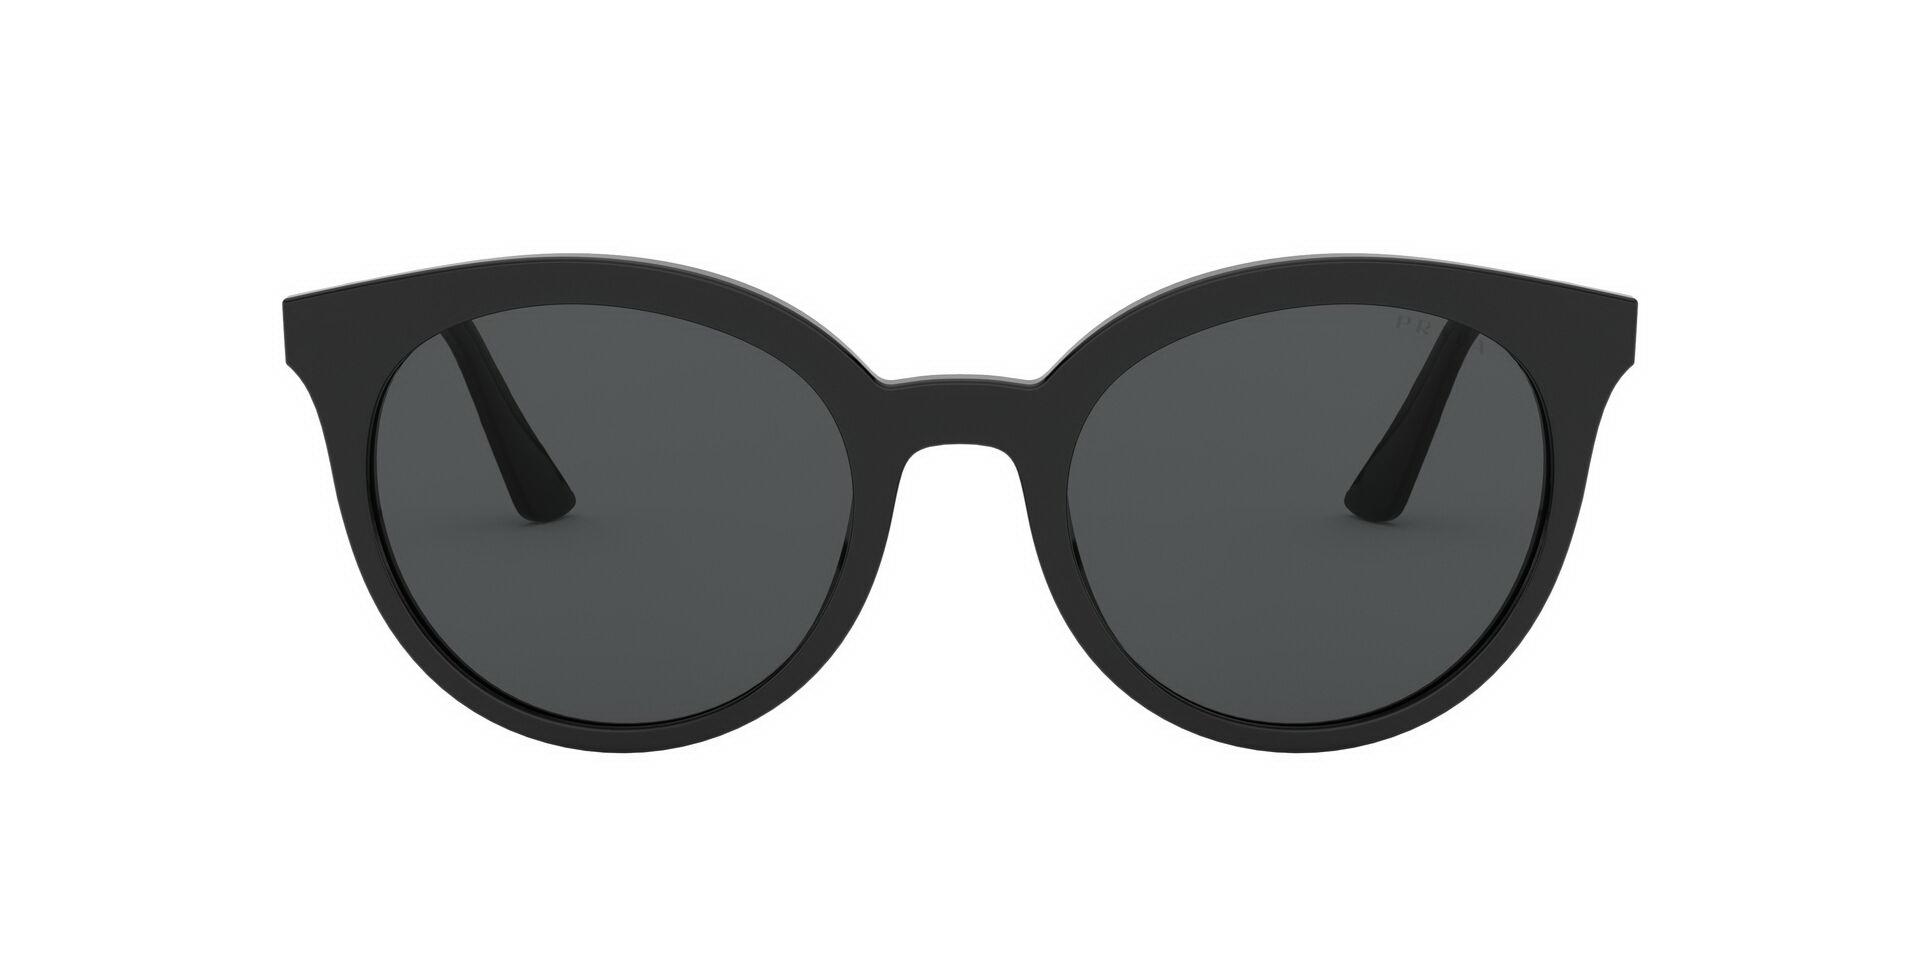 Солнцезащитные очки Очки с/з PRADA 0PR 02XS 1AB5S0 фото